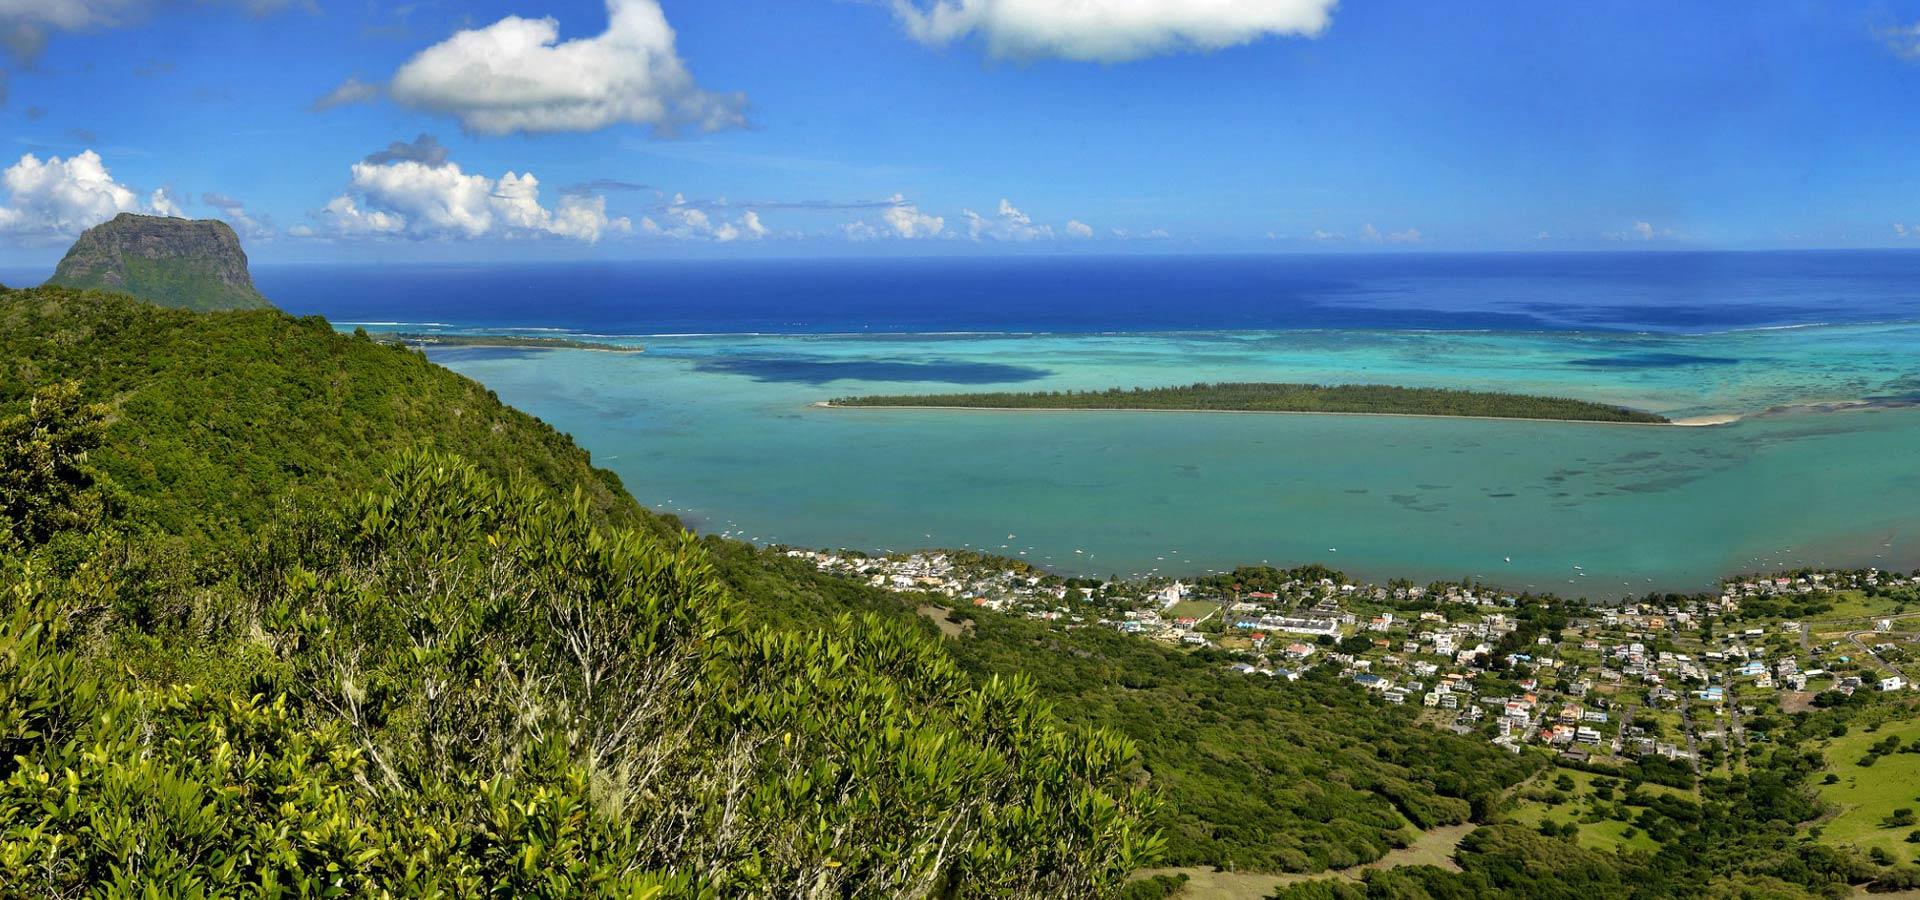 Le Morne Views - Mauritius - Ebony Forest